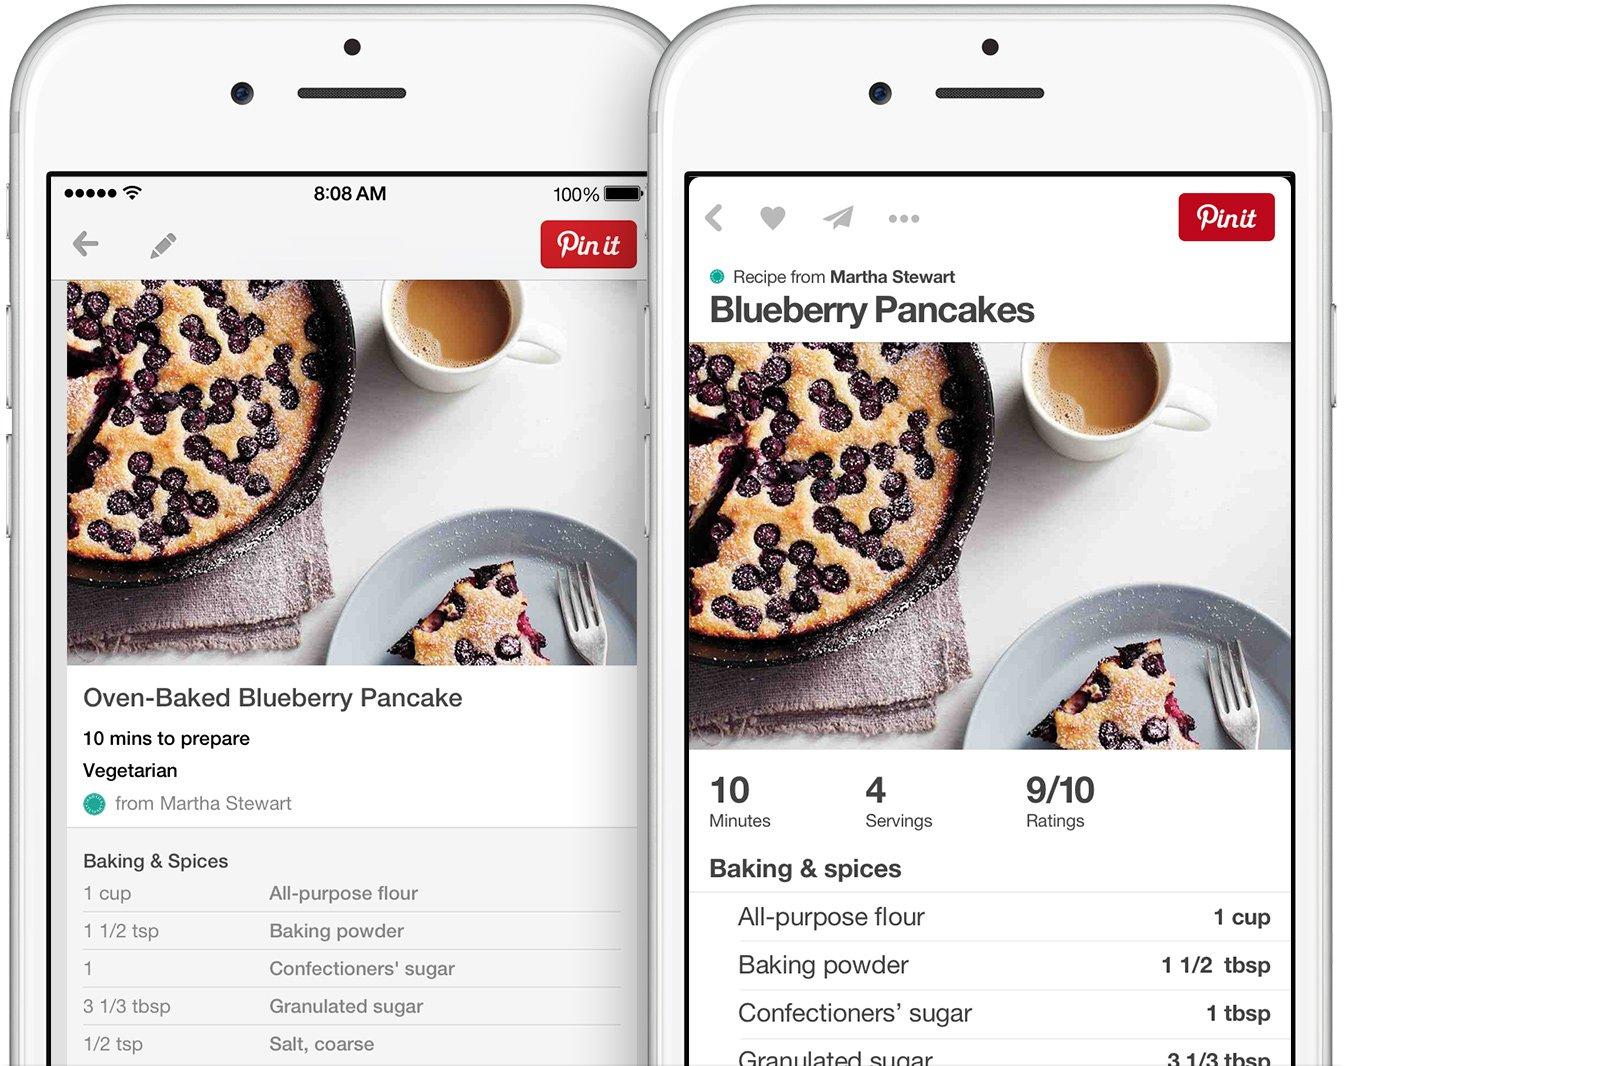 Pinterest adds measurement, data vendors to its Marketing